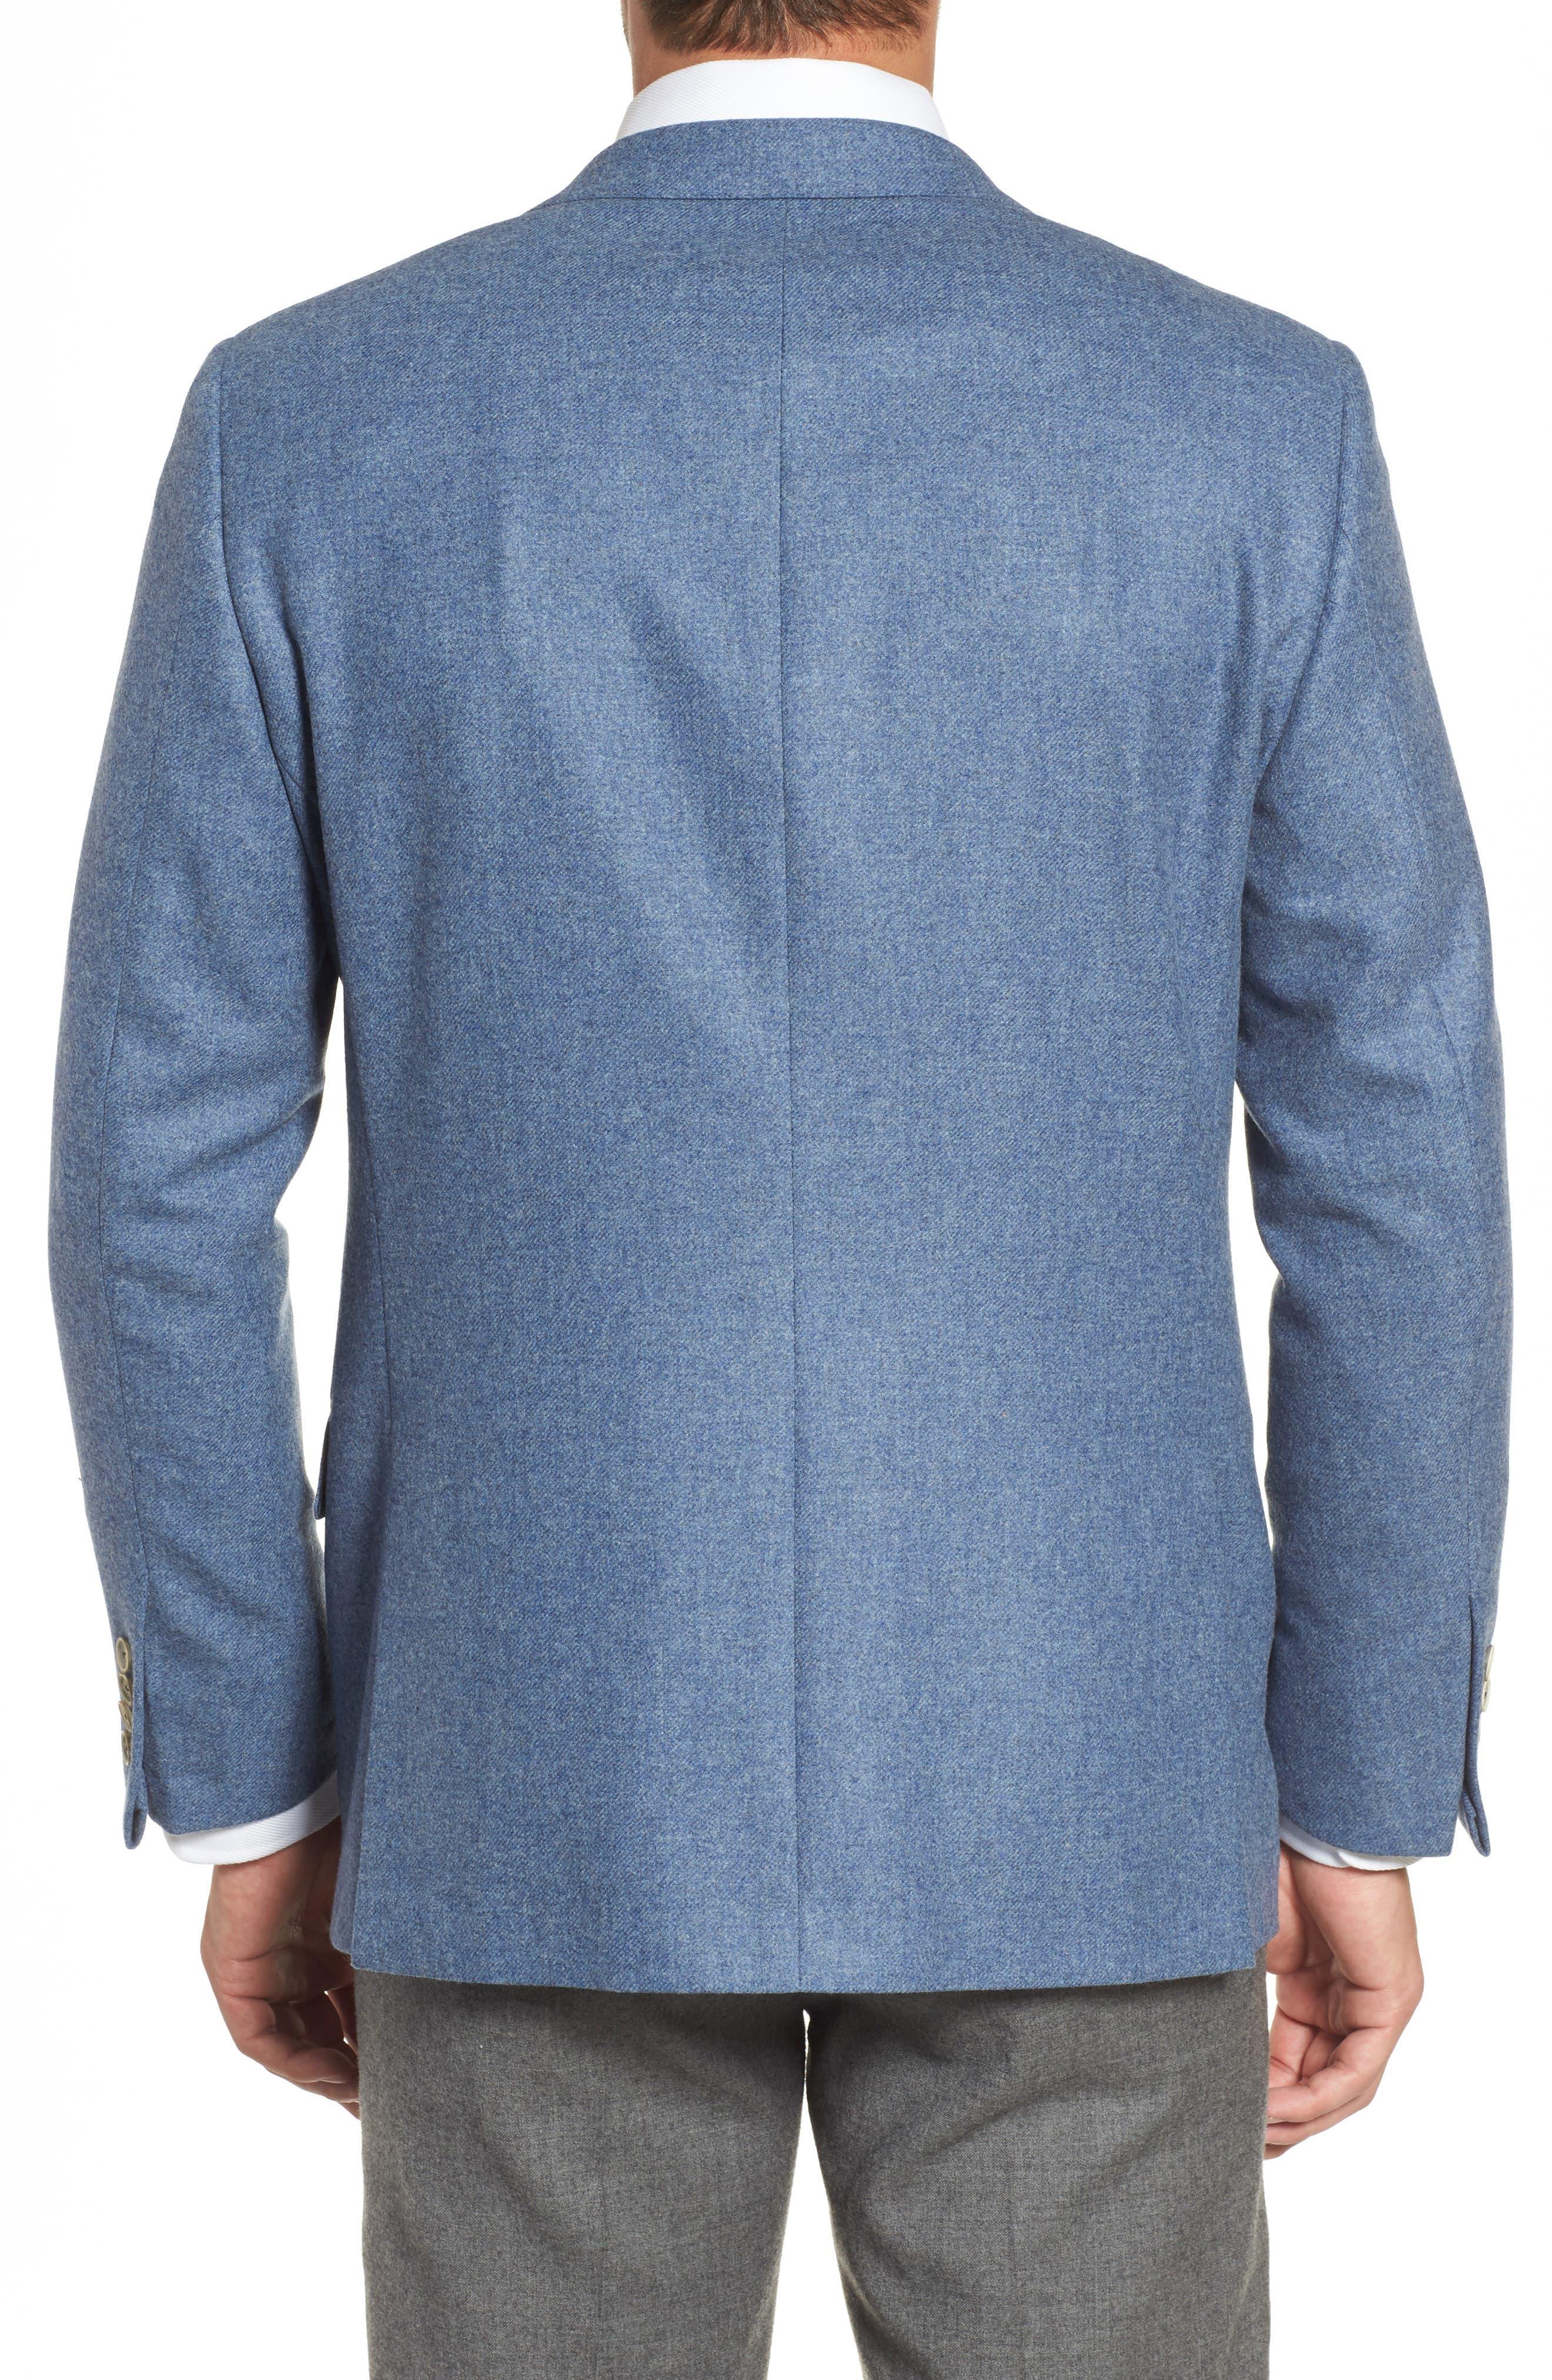 Beacon Classic Fit Wool & Cashmere Blazer,                             Alternate thumbnail 2, color,                             450